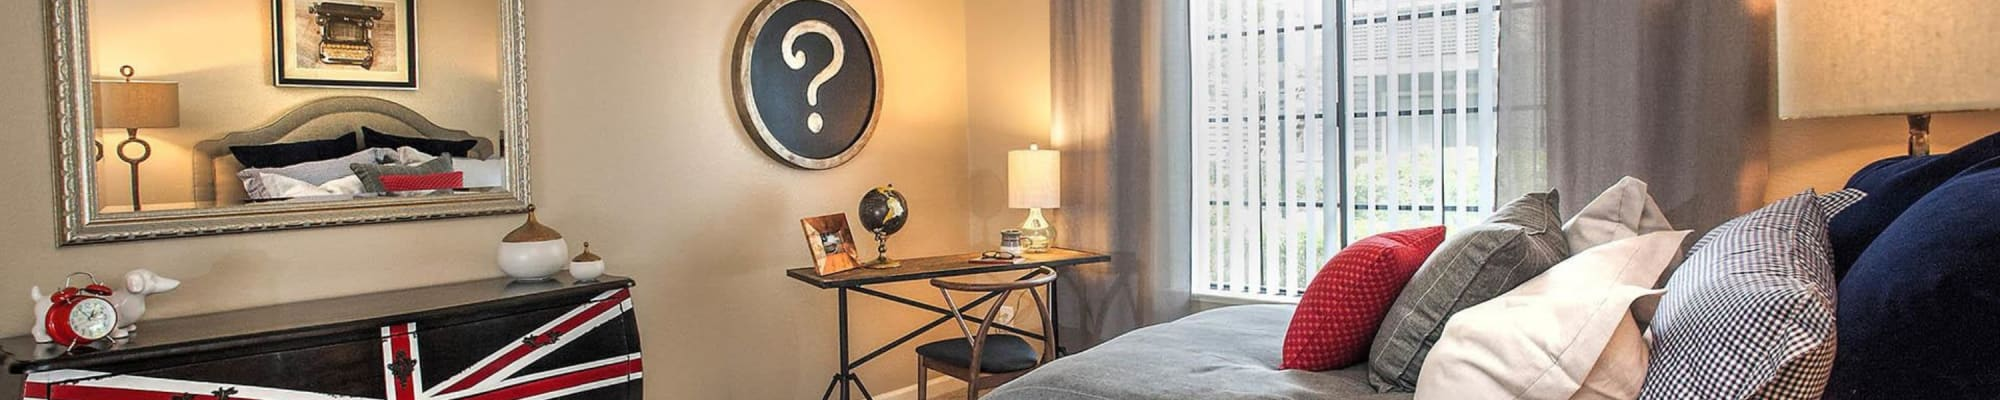 Photo gallery at Hidden Lake Condominium Rentals in Sacramento, California